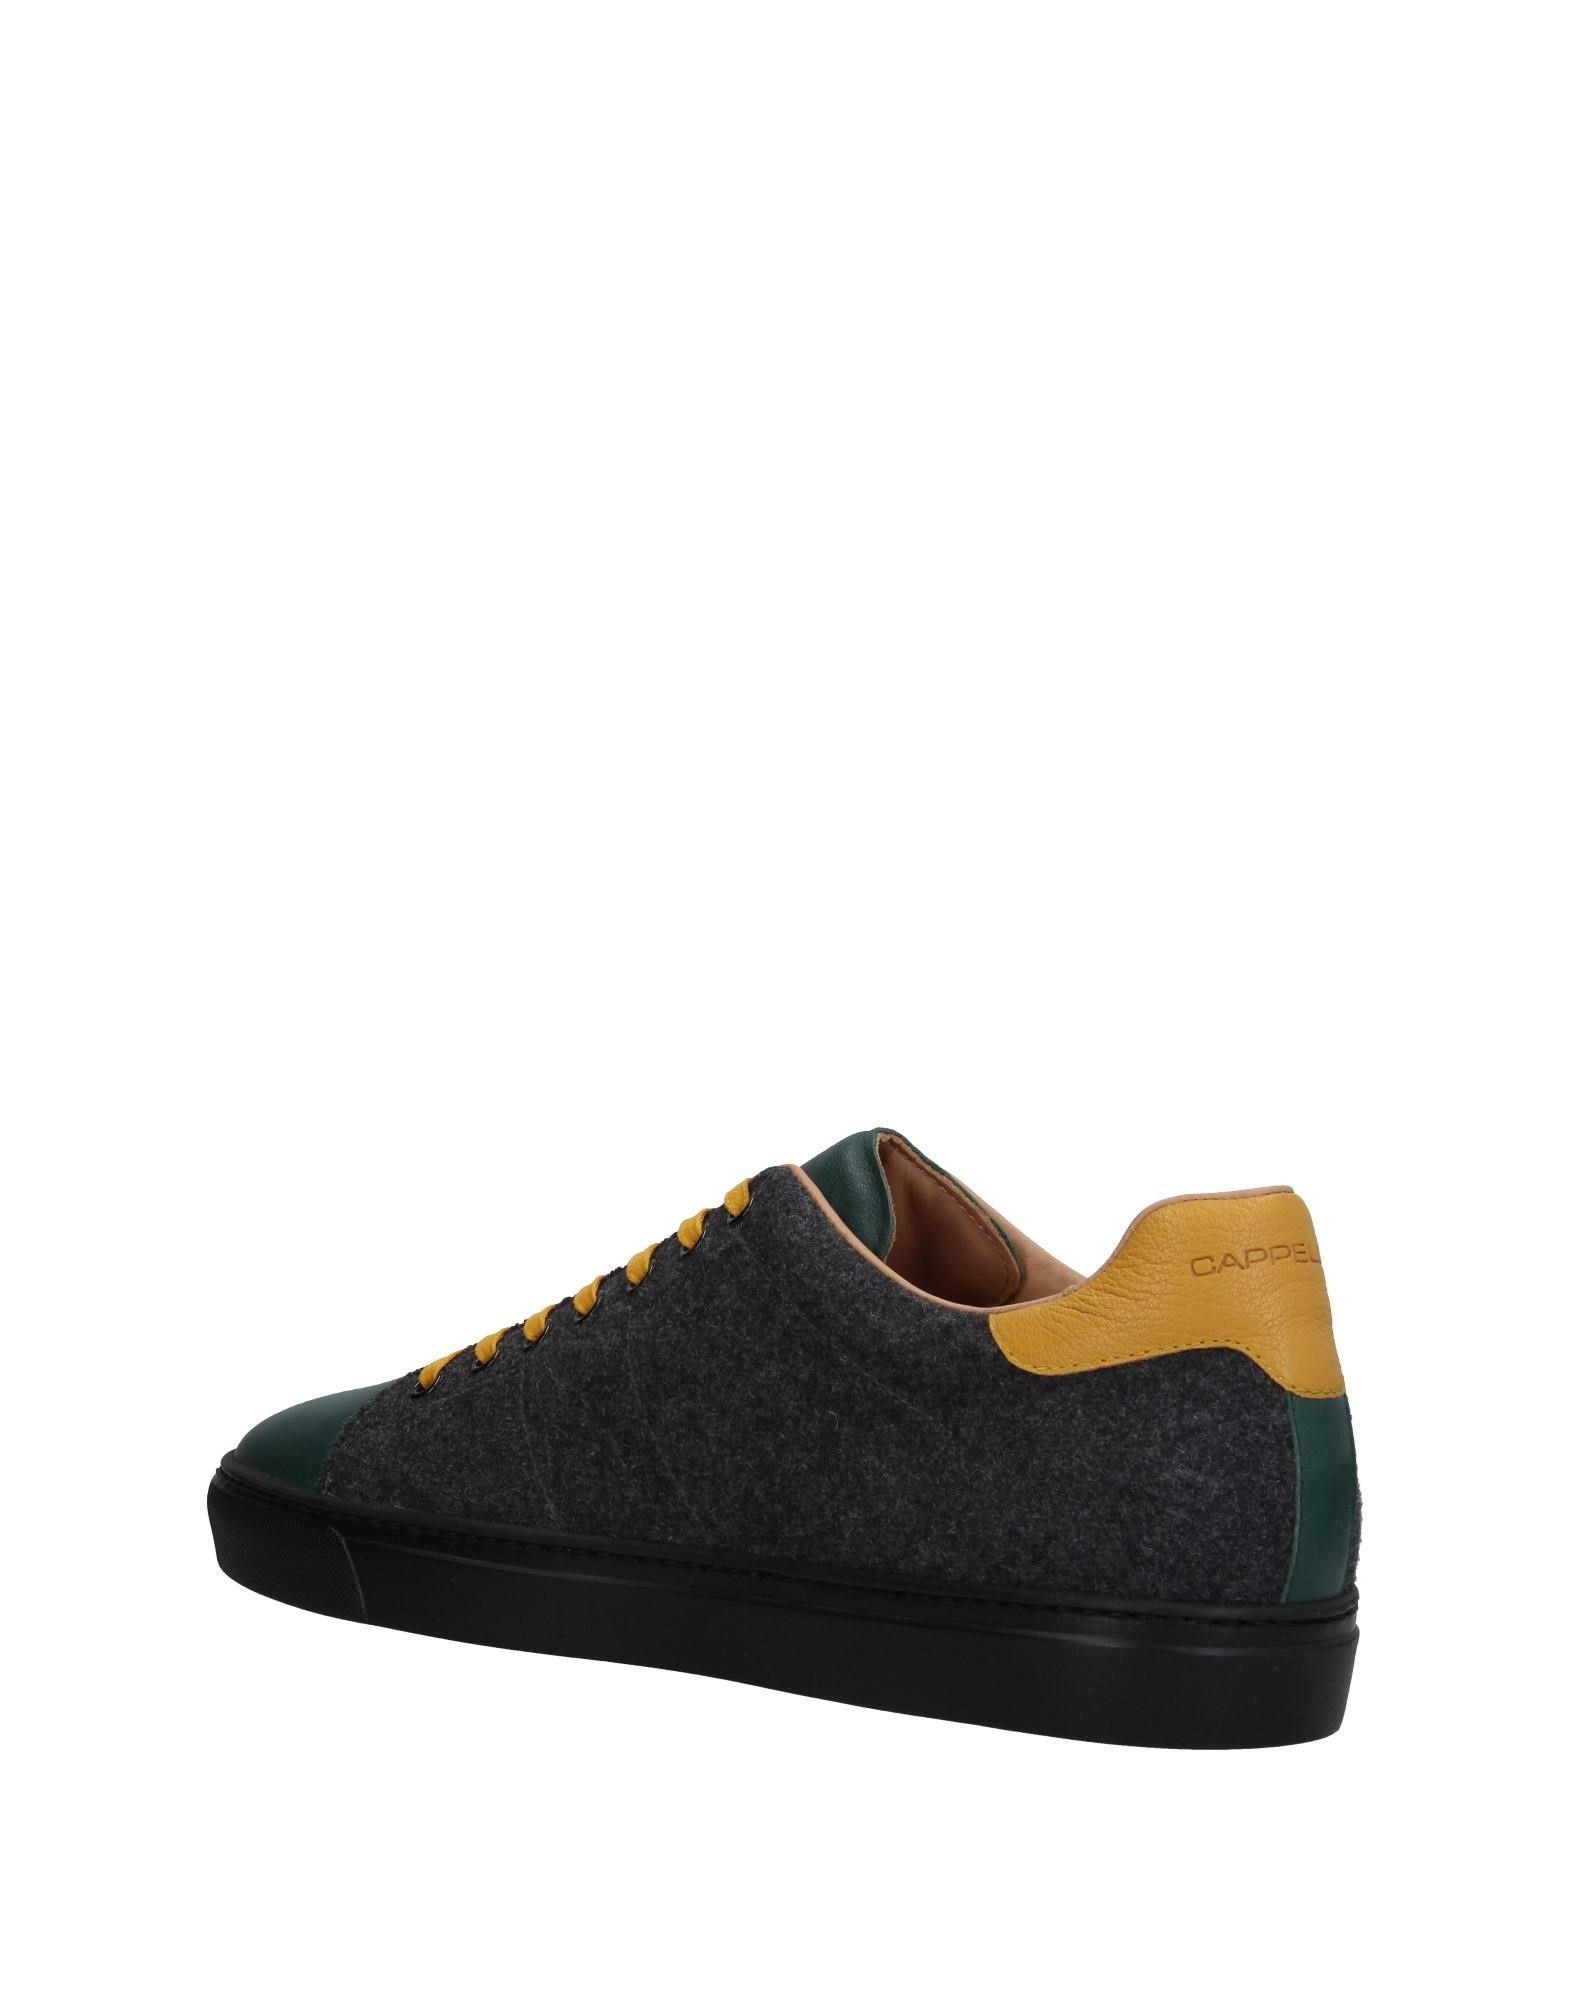 Sneakers Cappelletti Homme - Sneakers Cappelletti sur